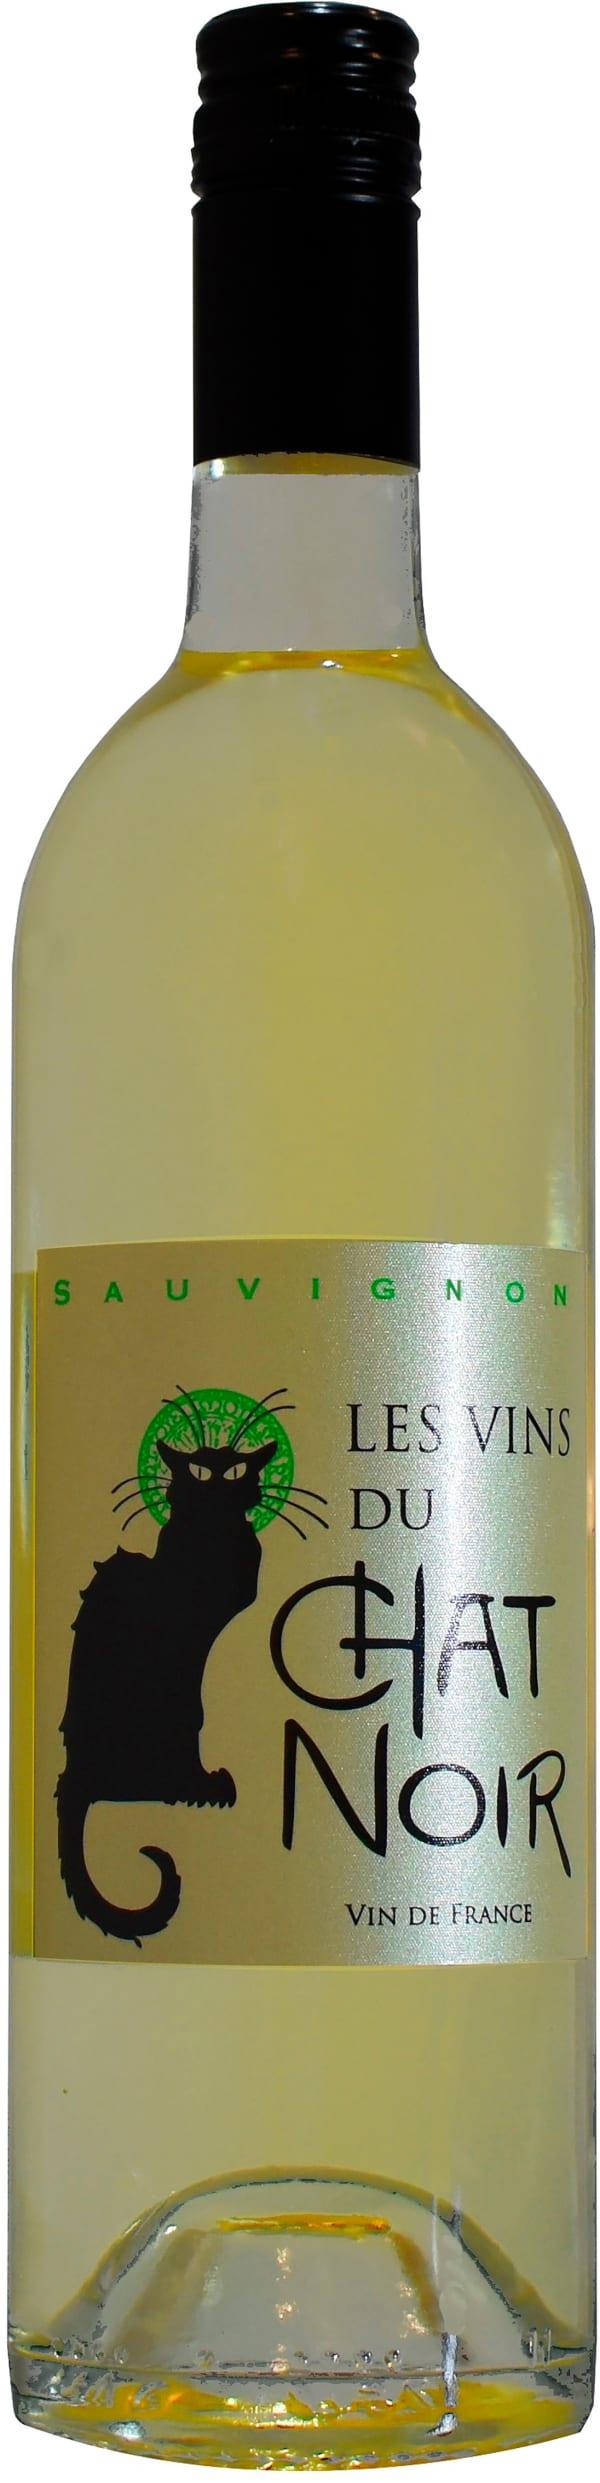 Chat Noir Sauvignon Blanc